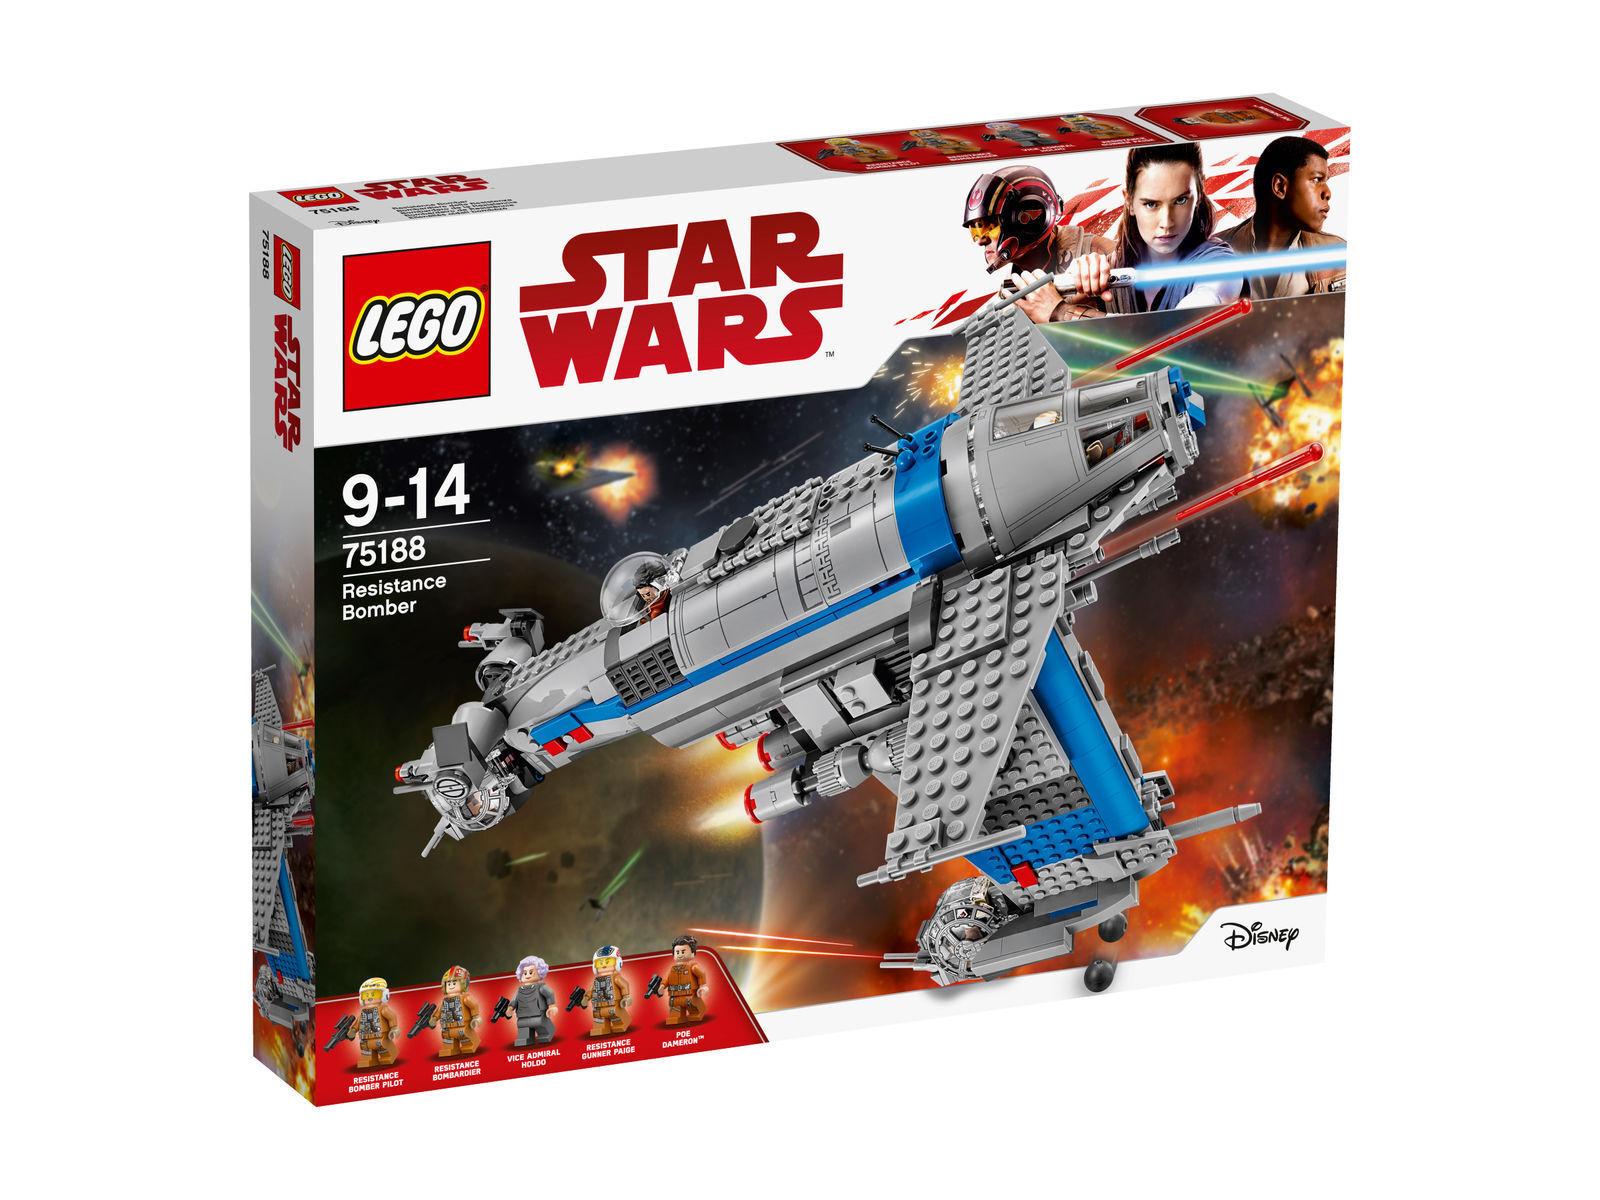 LEGO Star Wars (75188) Resistance Bomber, NEU / OVP